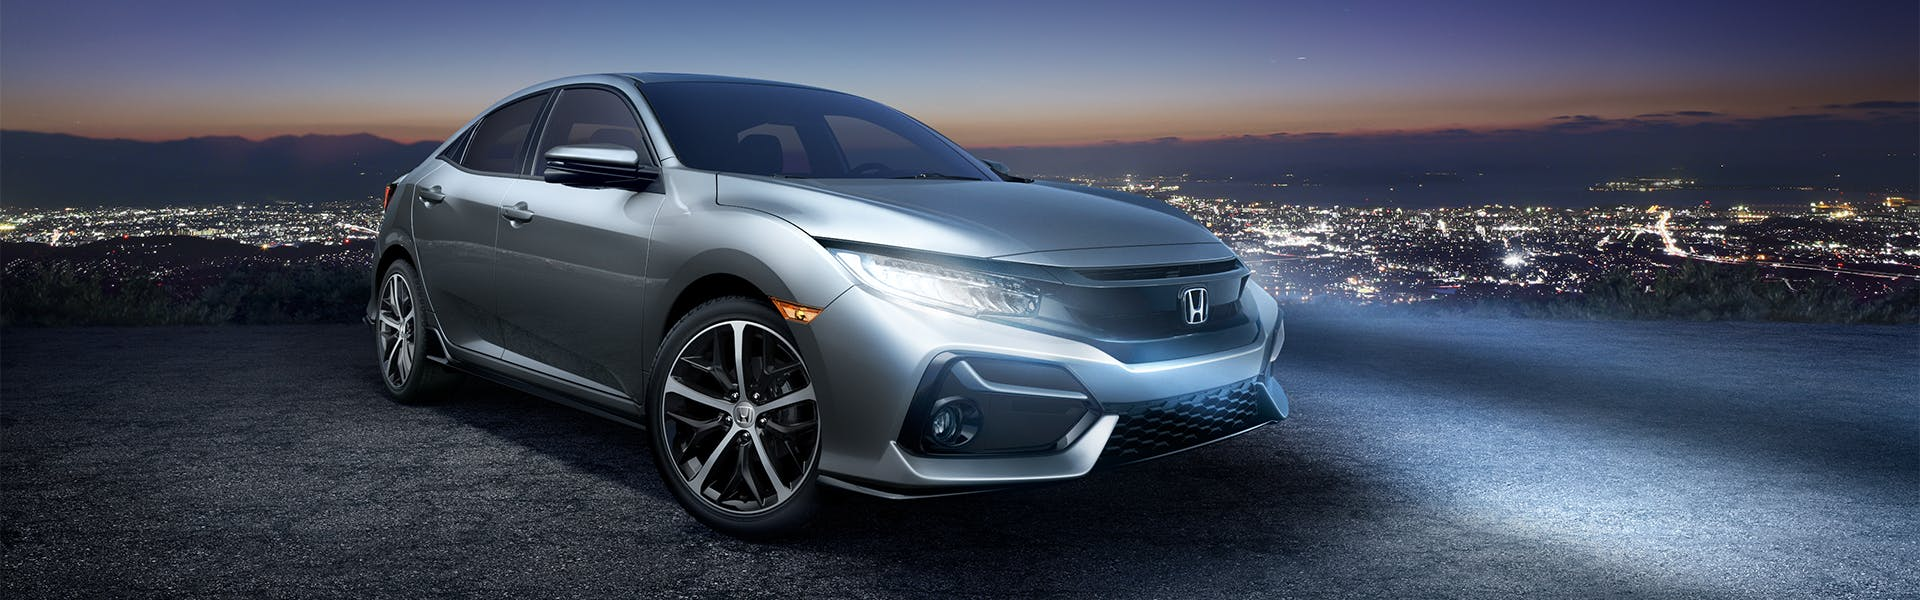 Washington Honda is a Honda Dealership in Washington near Bethel Park PA | Silver 2020 Honda Civic Hatchback Parked on Cliffside at Night with Headlights On